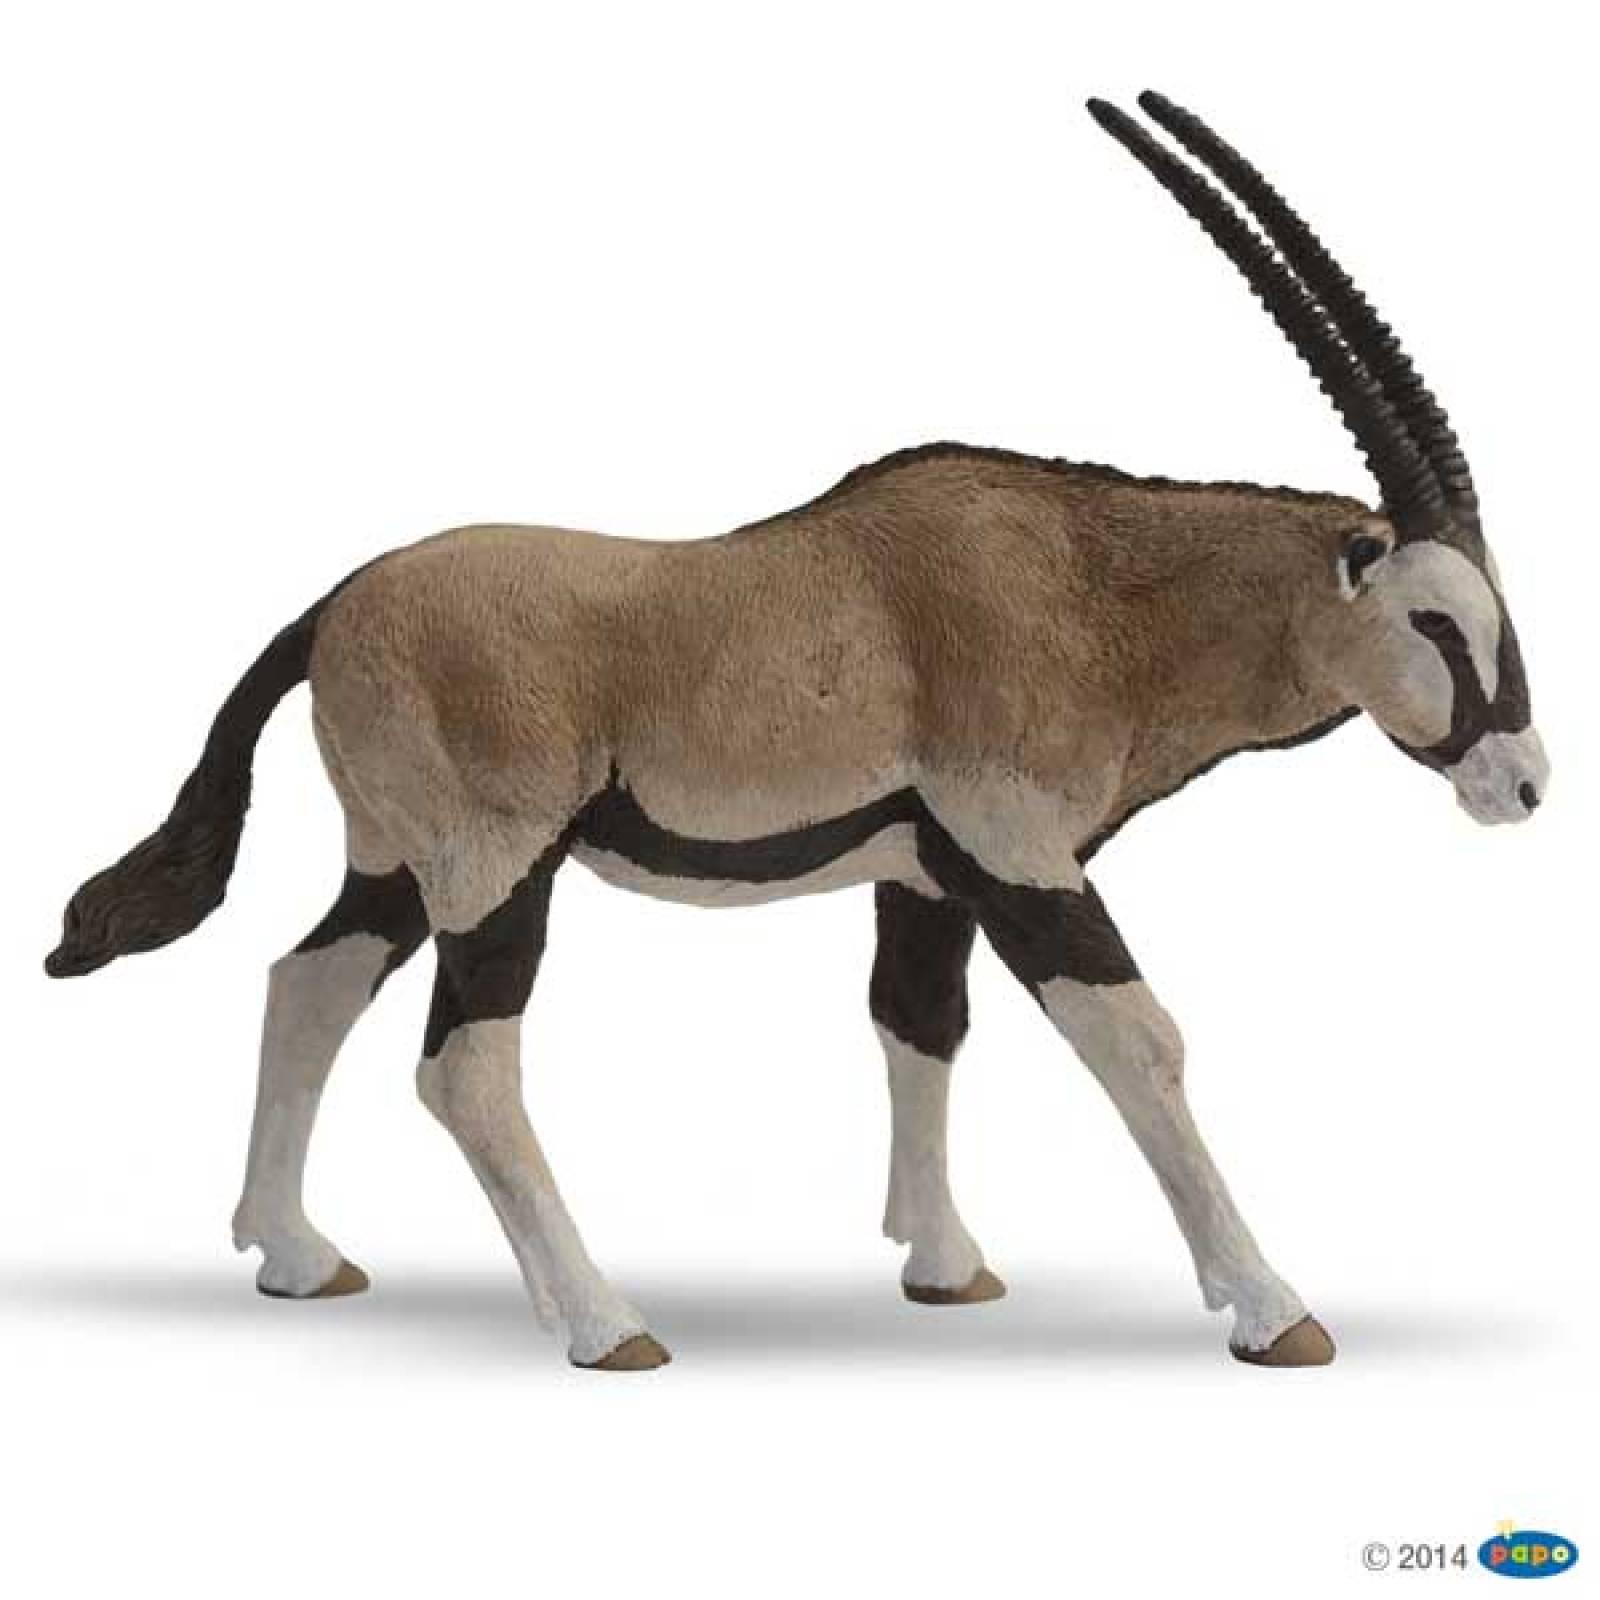 Oryx Antelope PAPO WILD ANIMAL